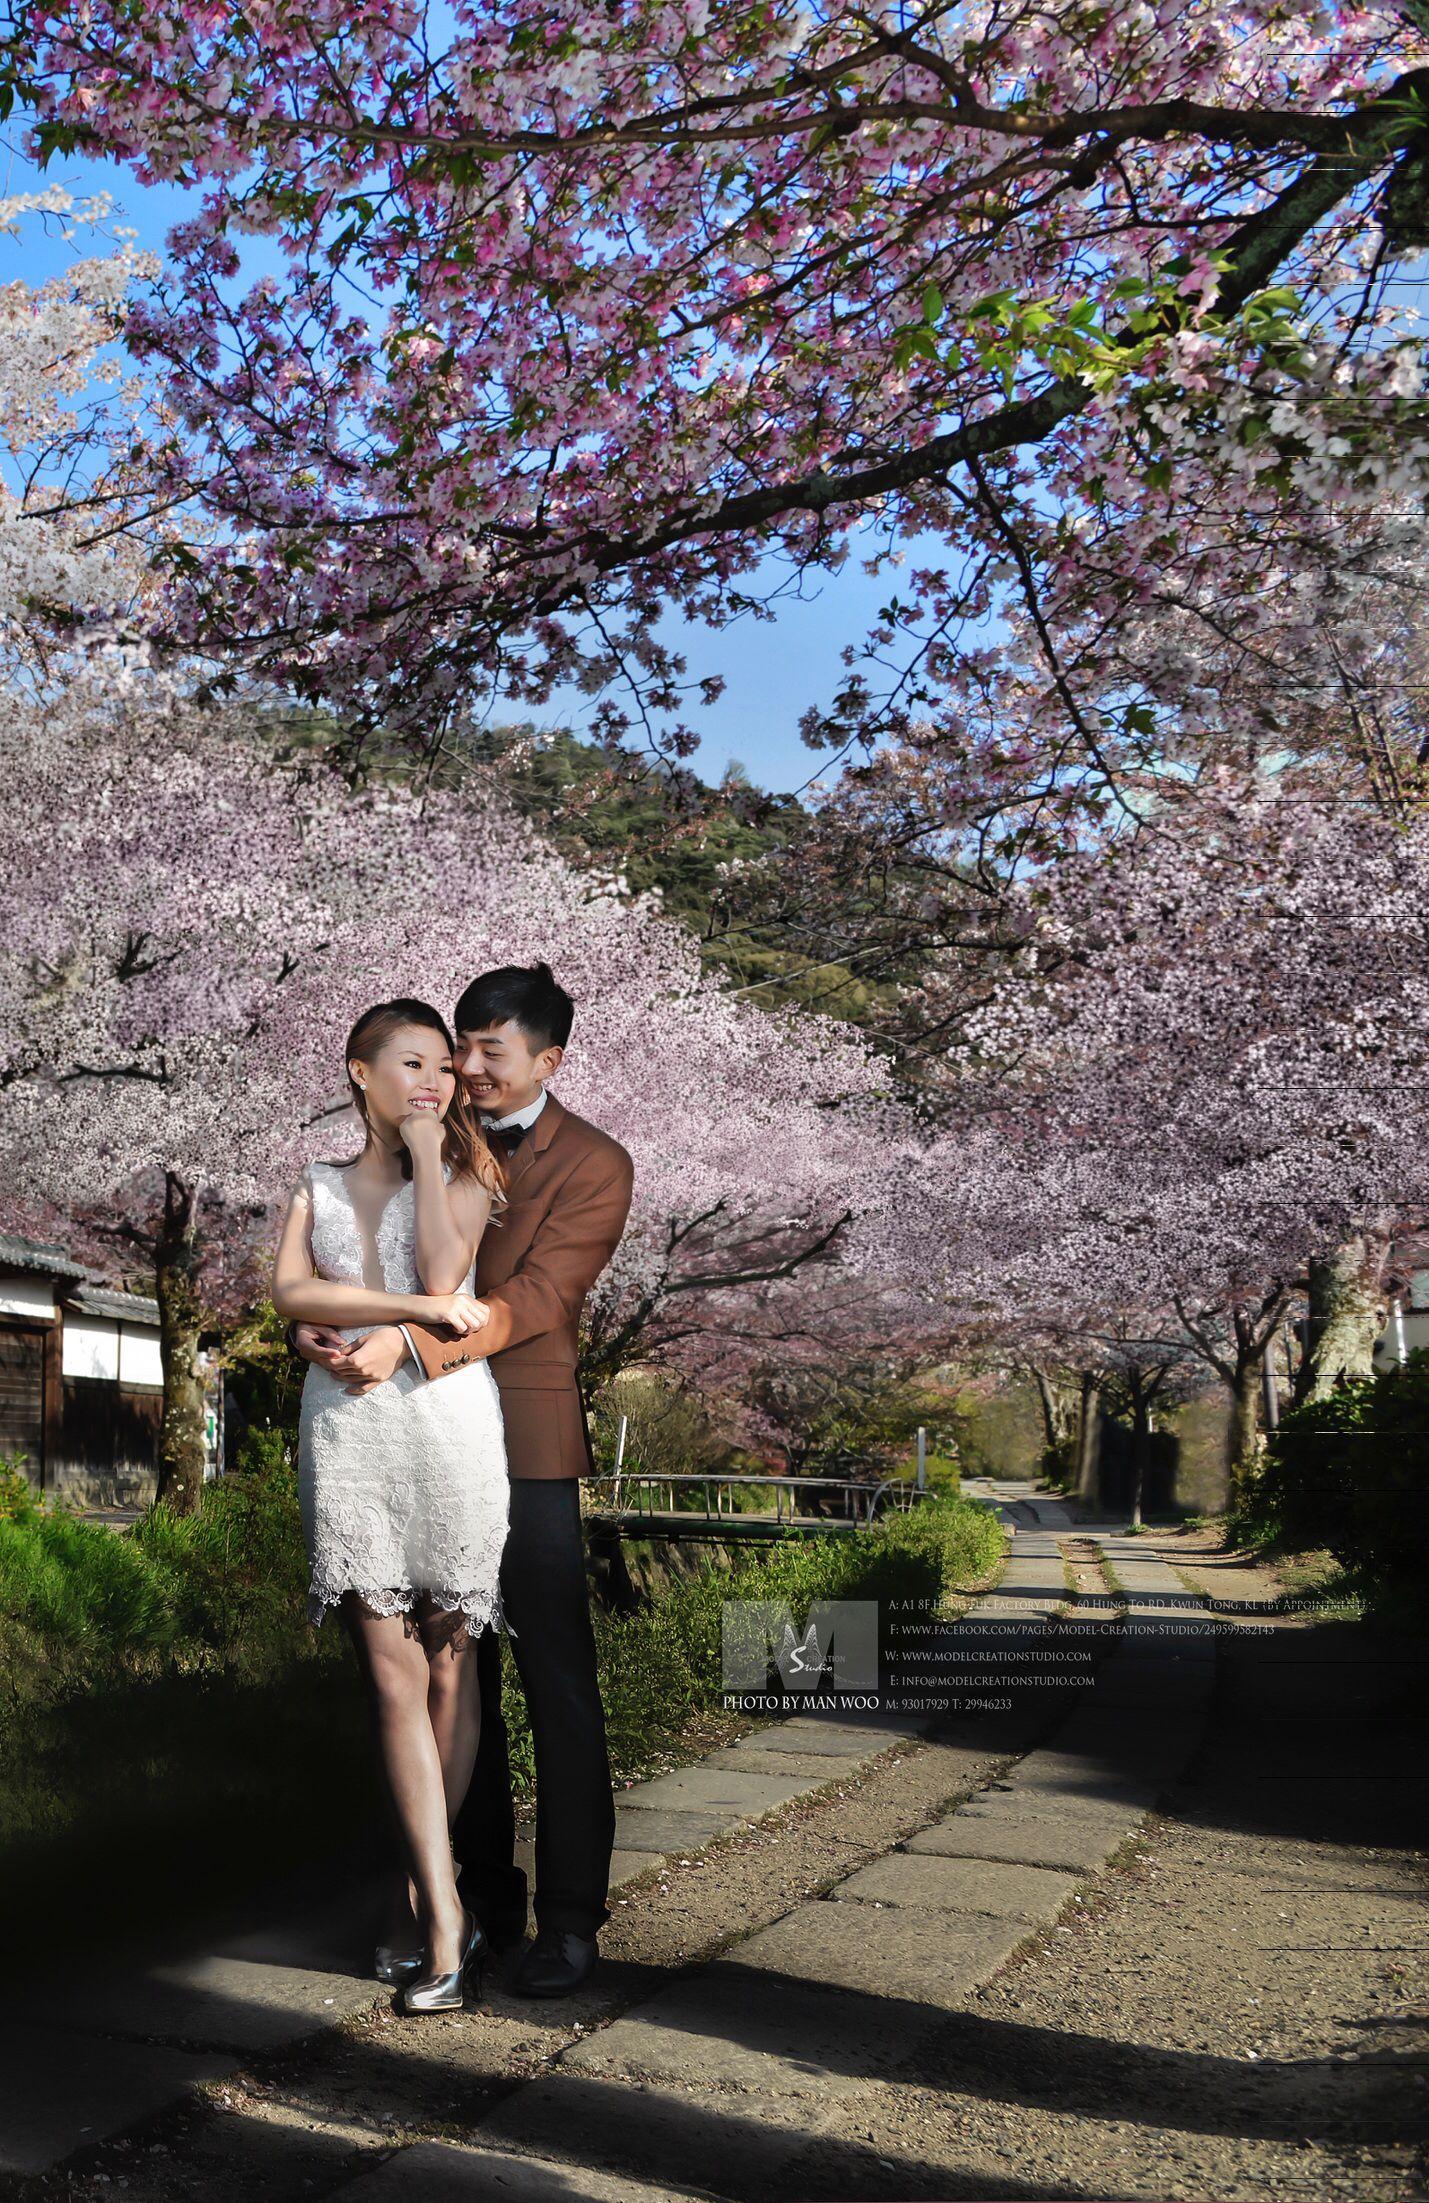 #Model_Creation_Studio#pre-wedding#Wedding#wedding#photo#modelcreationstudio.com#Bridal#magazine#